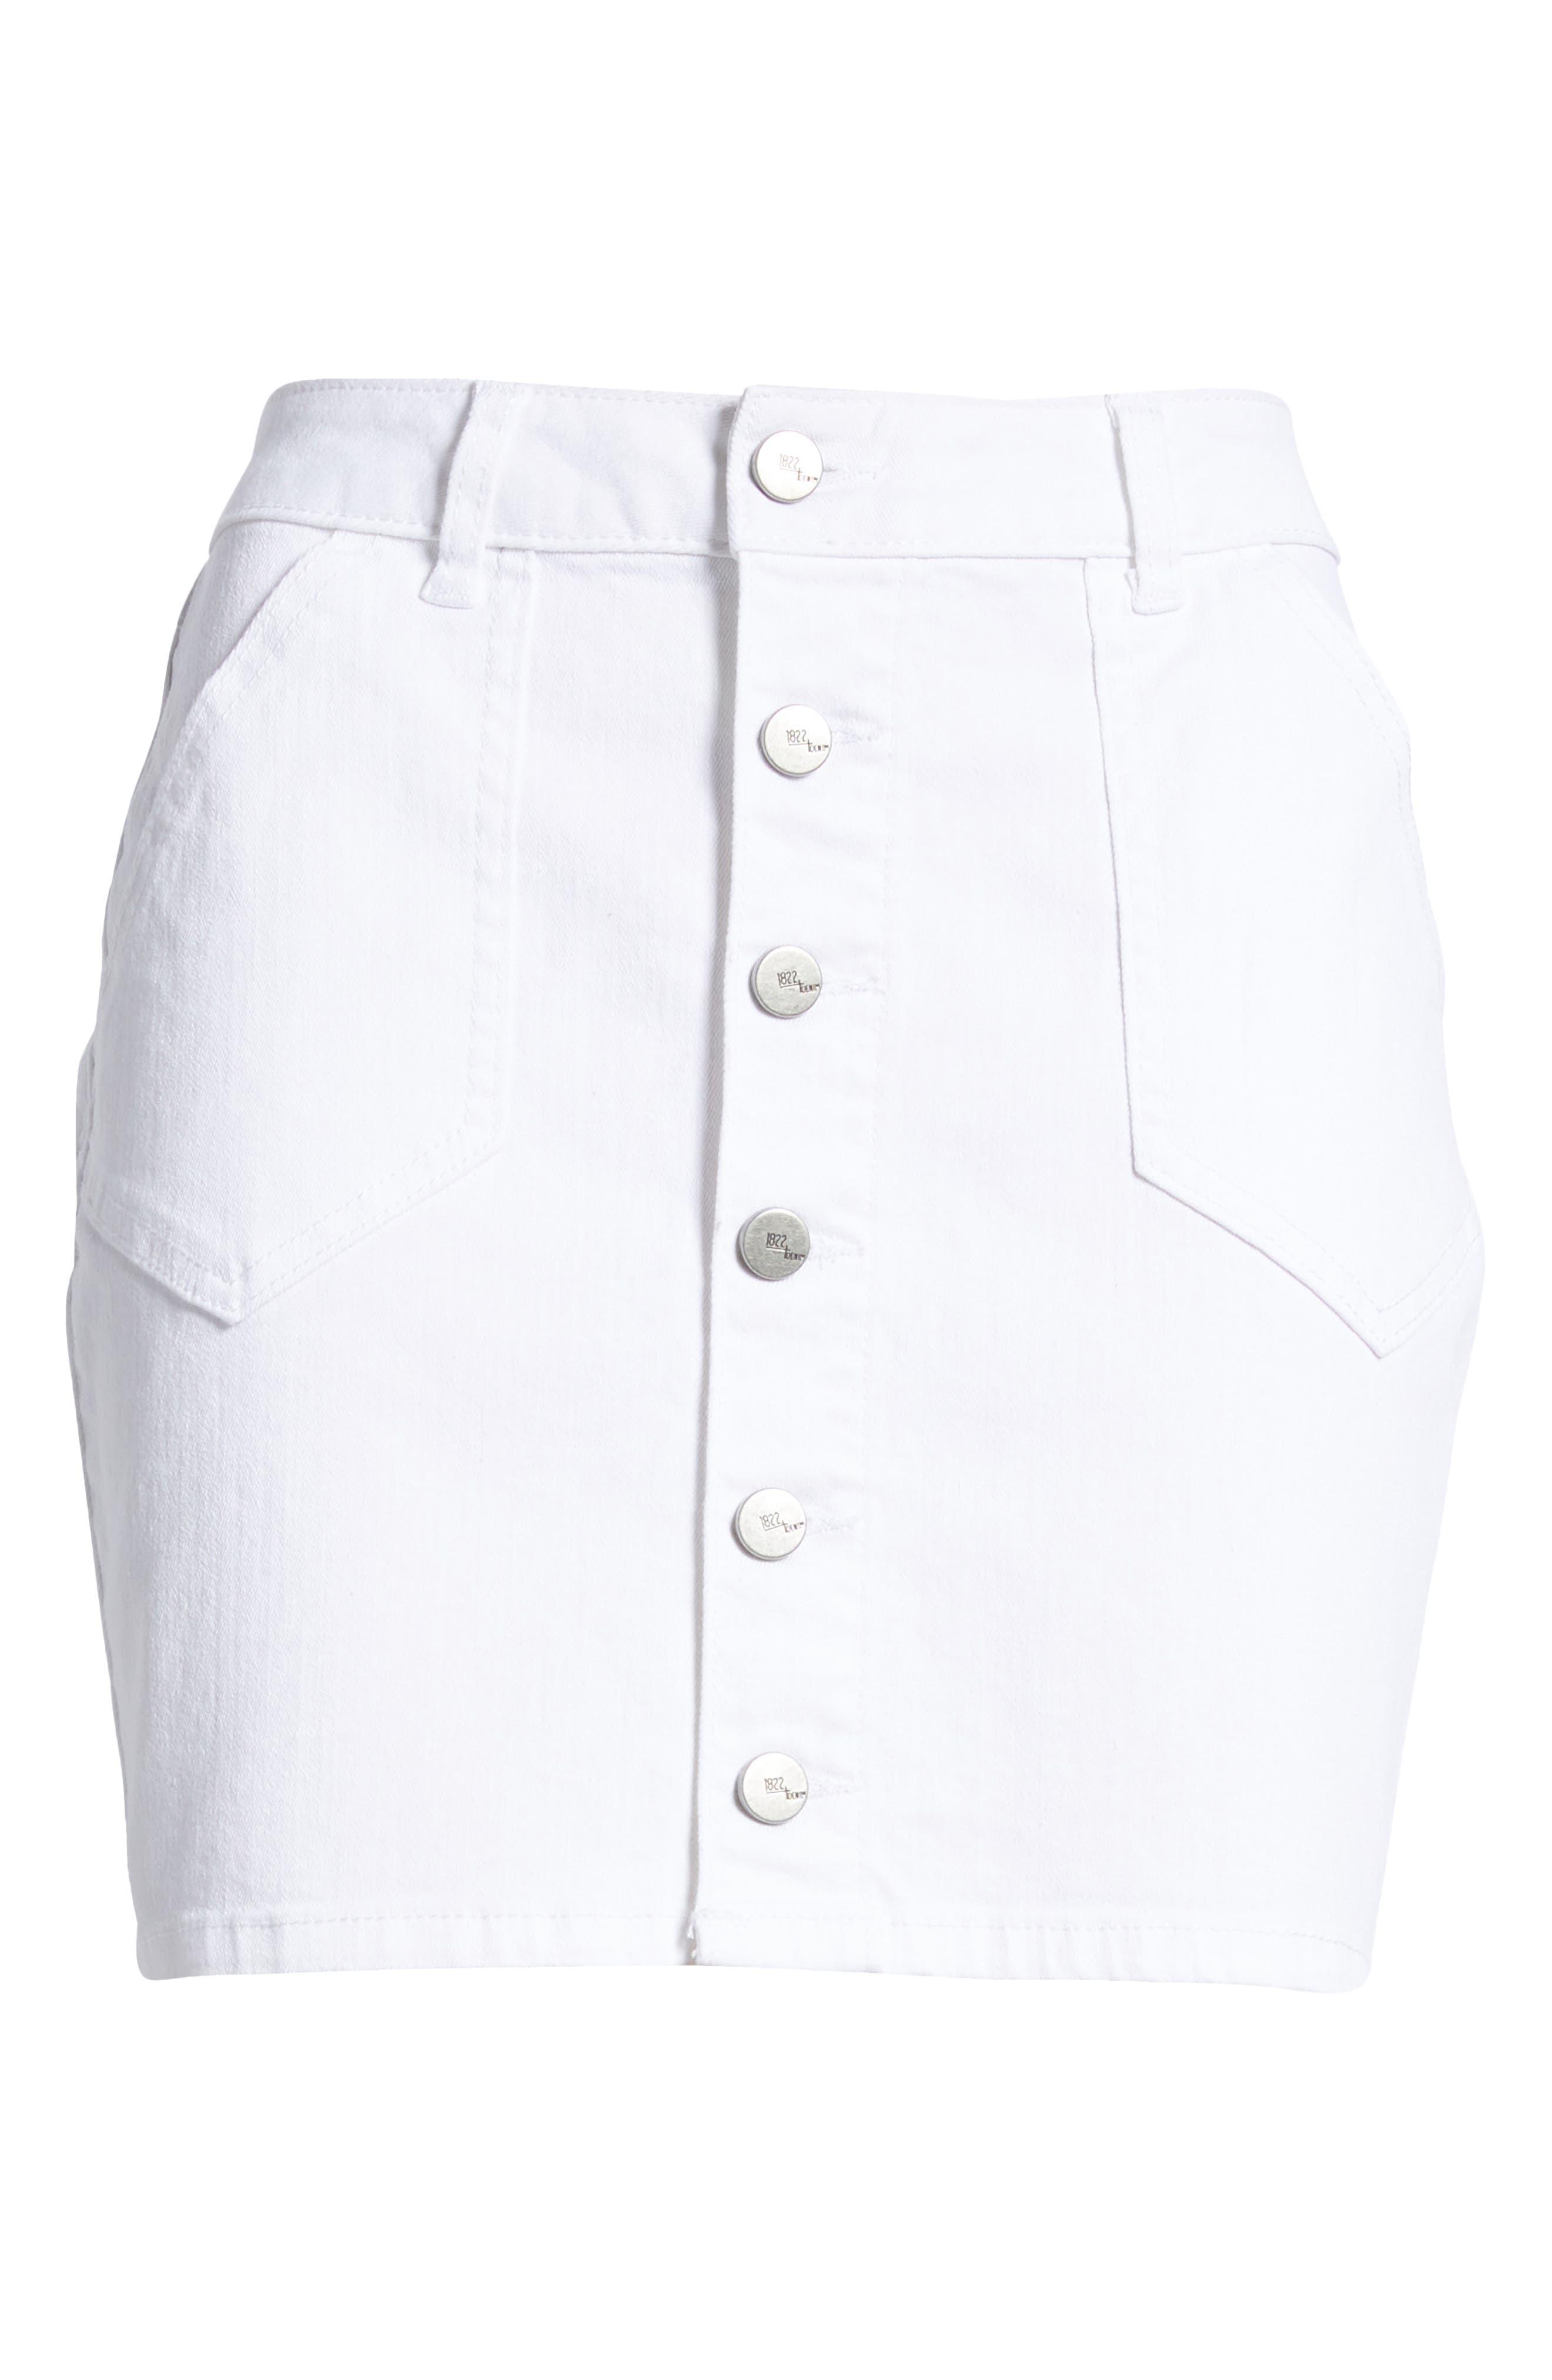 Womens Wrap Skort Denim Wrap Skirt Shorts Summer Holiday Side Slit Bodycon Dress